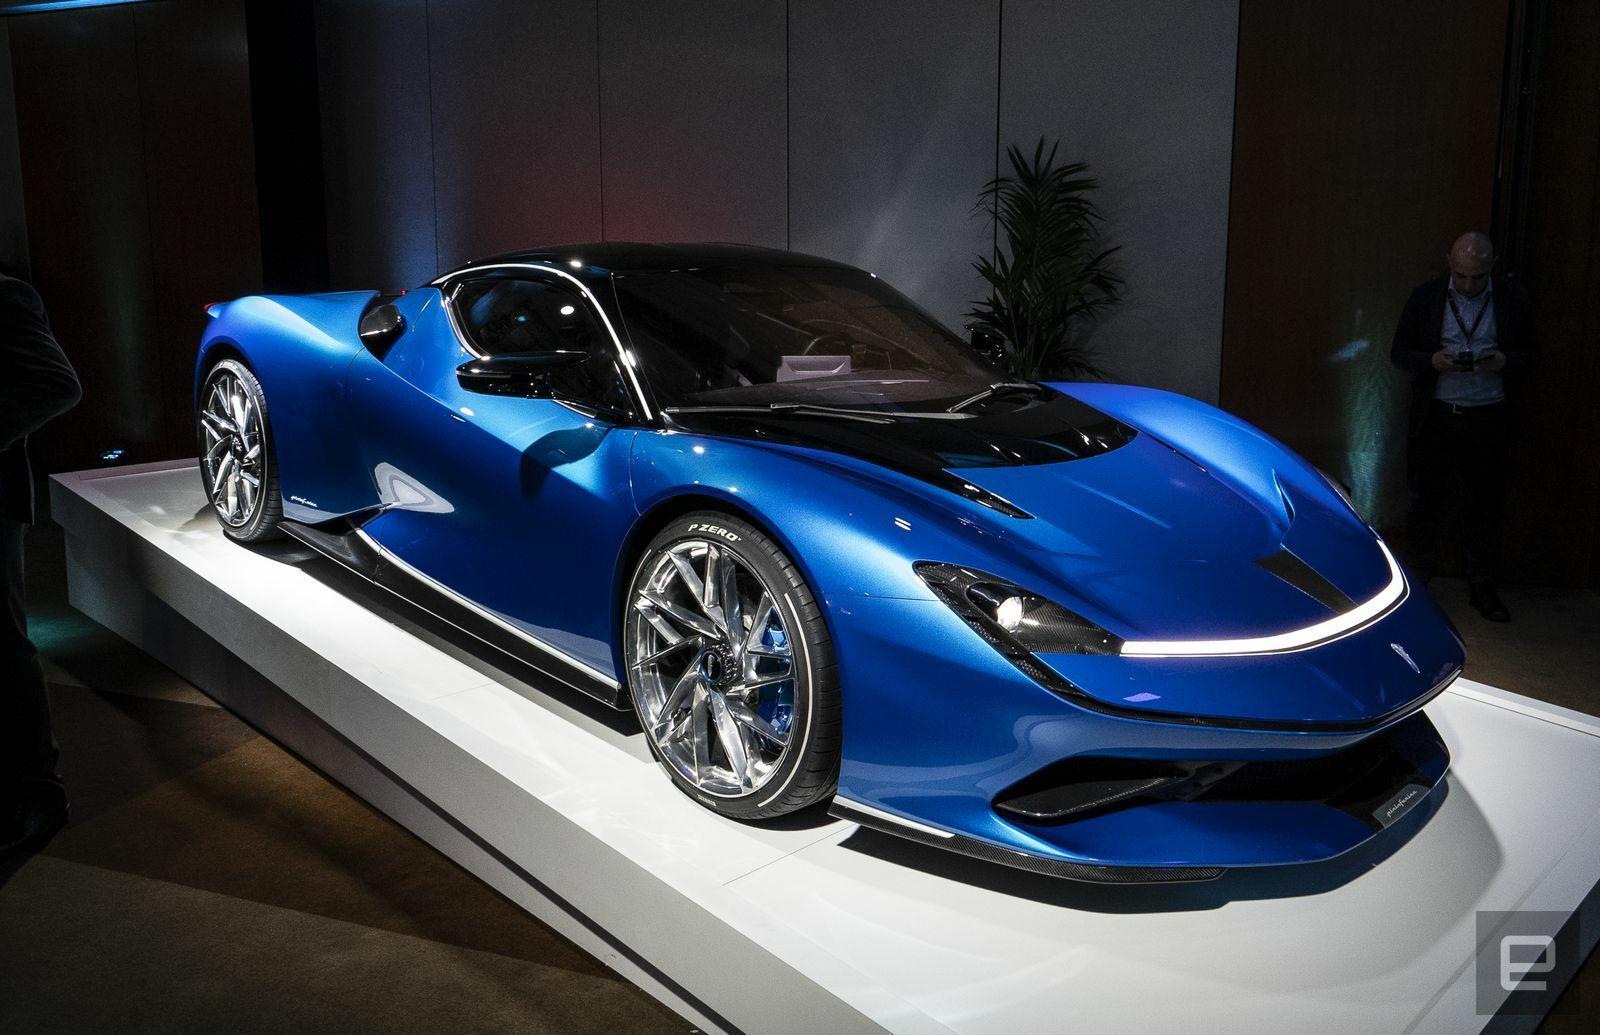 Pininfarina S 1900 Horsepower Battista Will Go Over 217 Mph Horsepower Geneva Motor Show Performance Cars